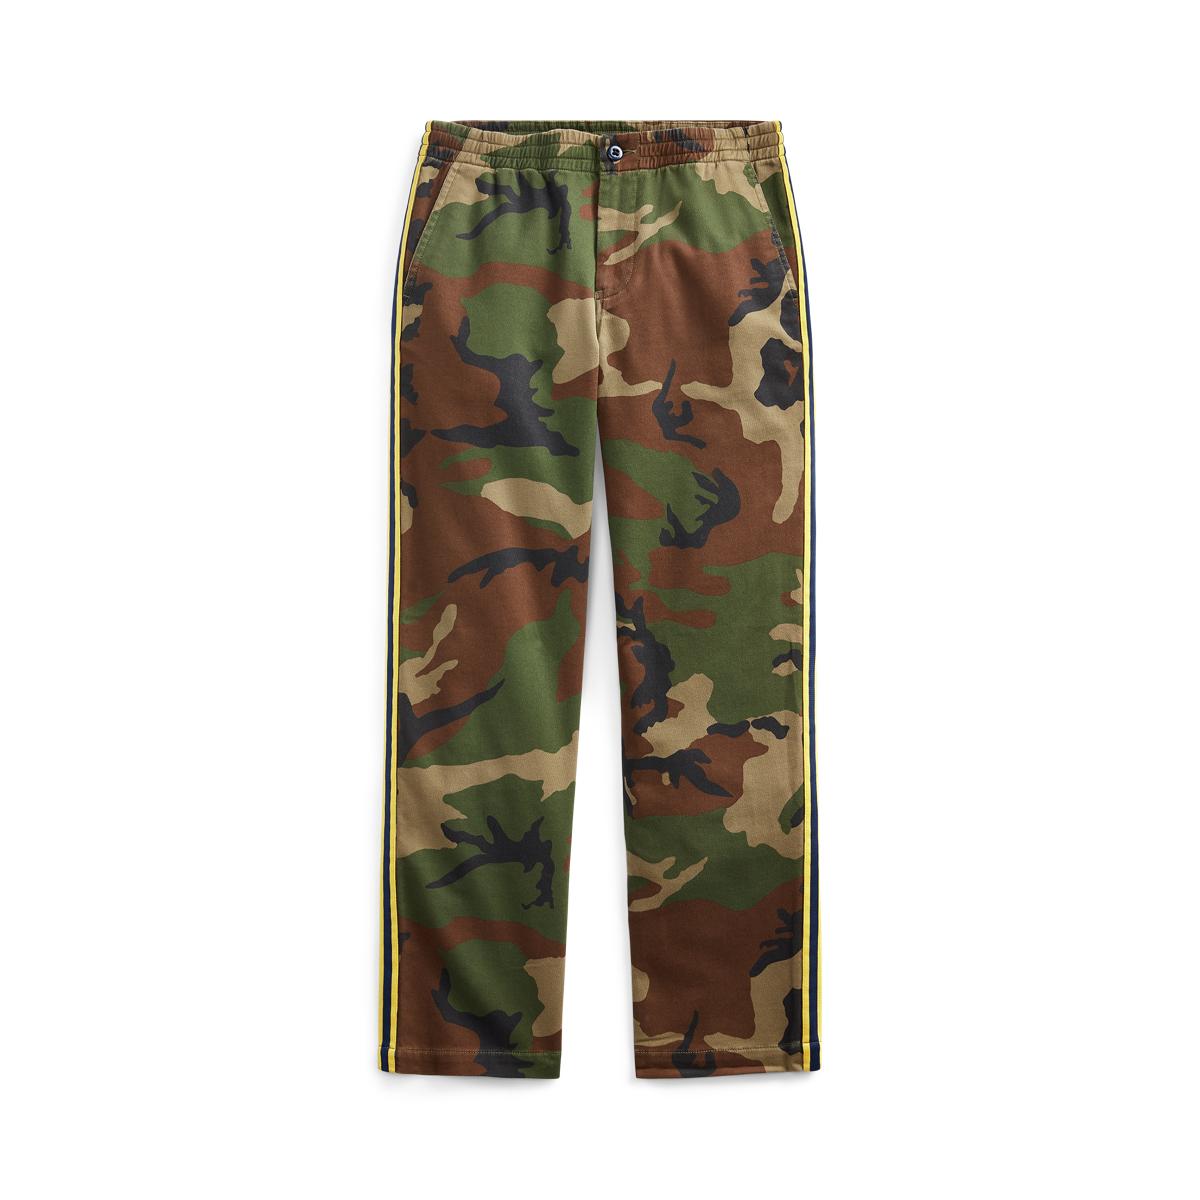 Pantalon Prepster Prepster Pantalon Polo Polo Camouflage Camouflage Pantalon UMGqSpzV